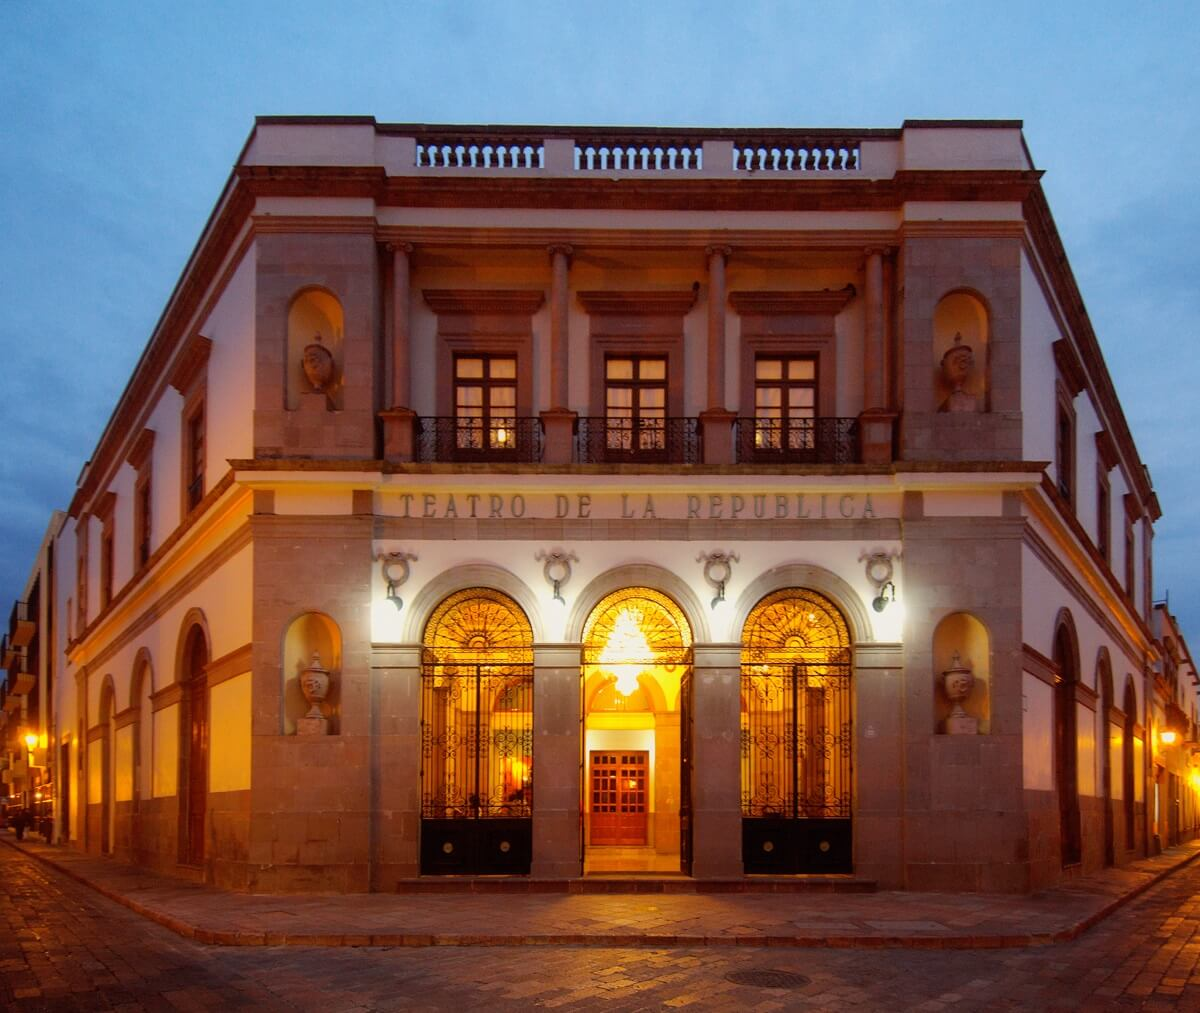 Teatro República Querétaro